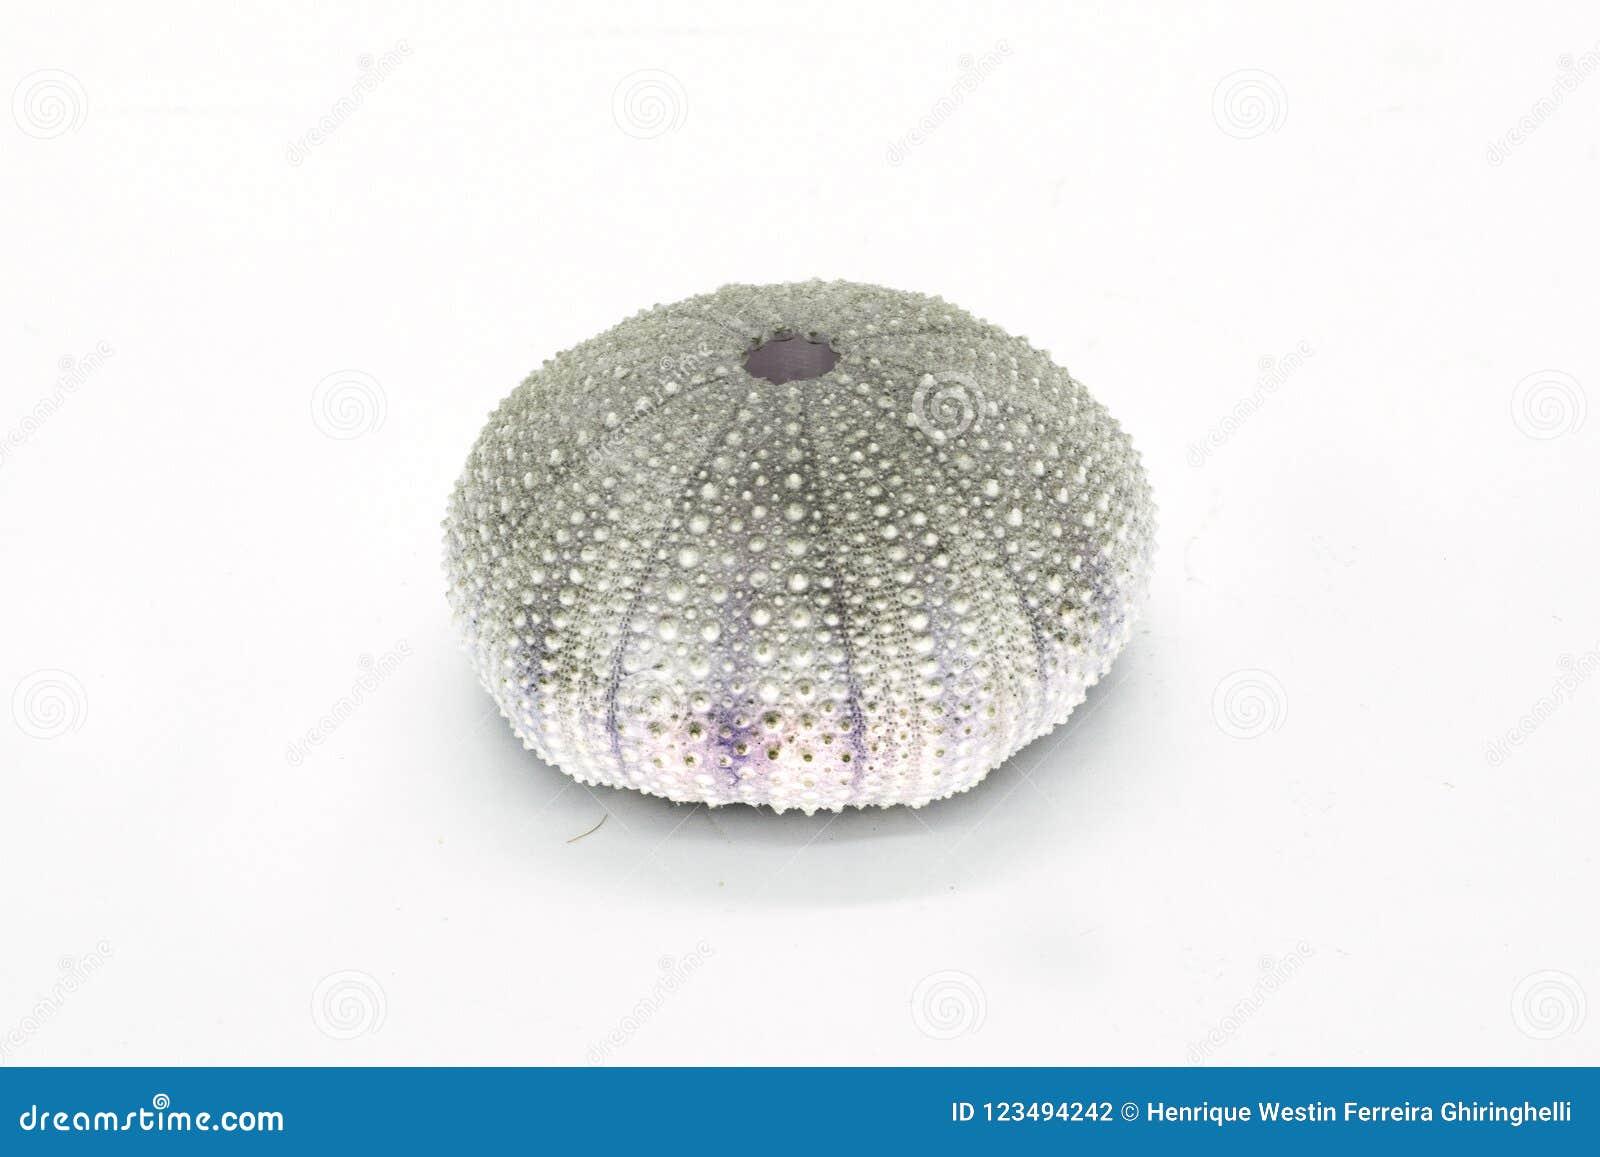 Shell arredondado isolado